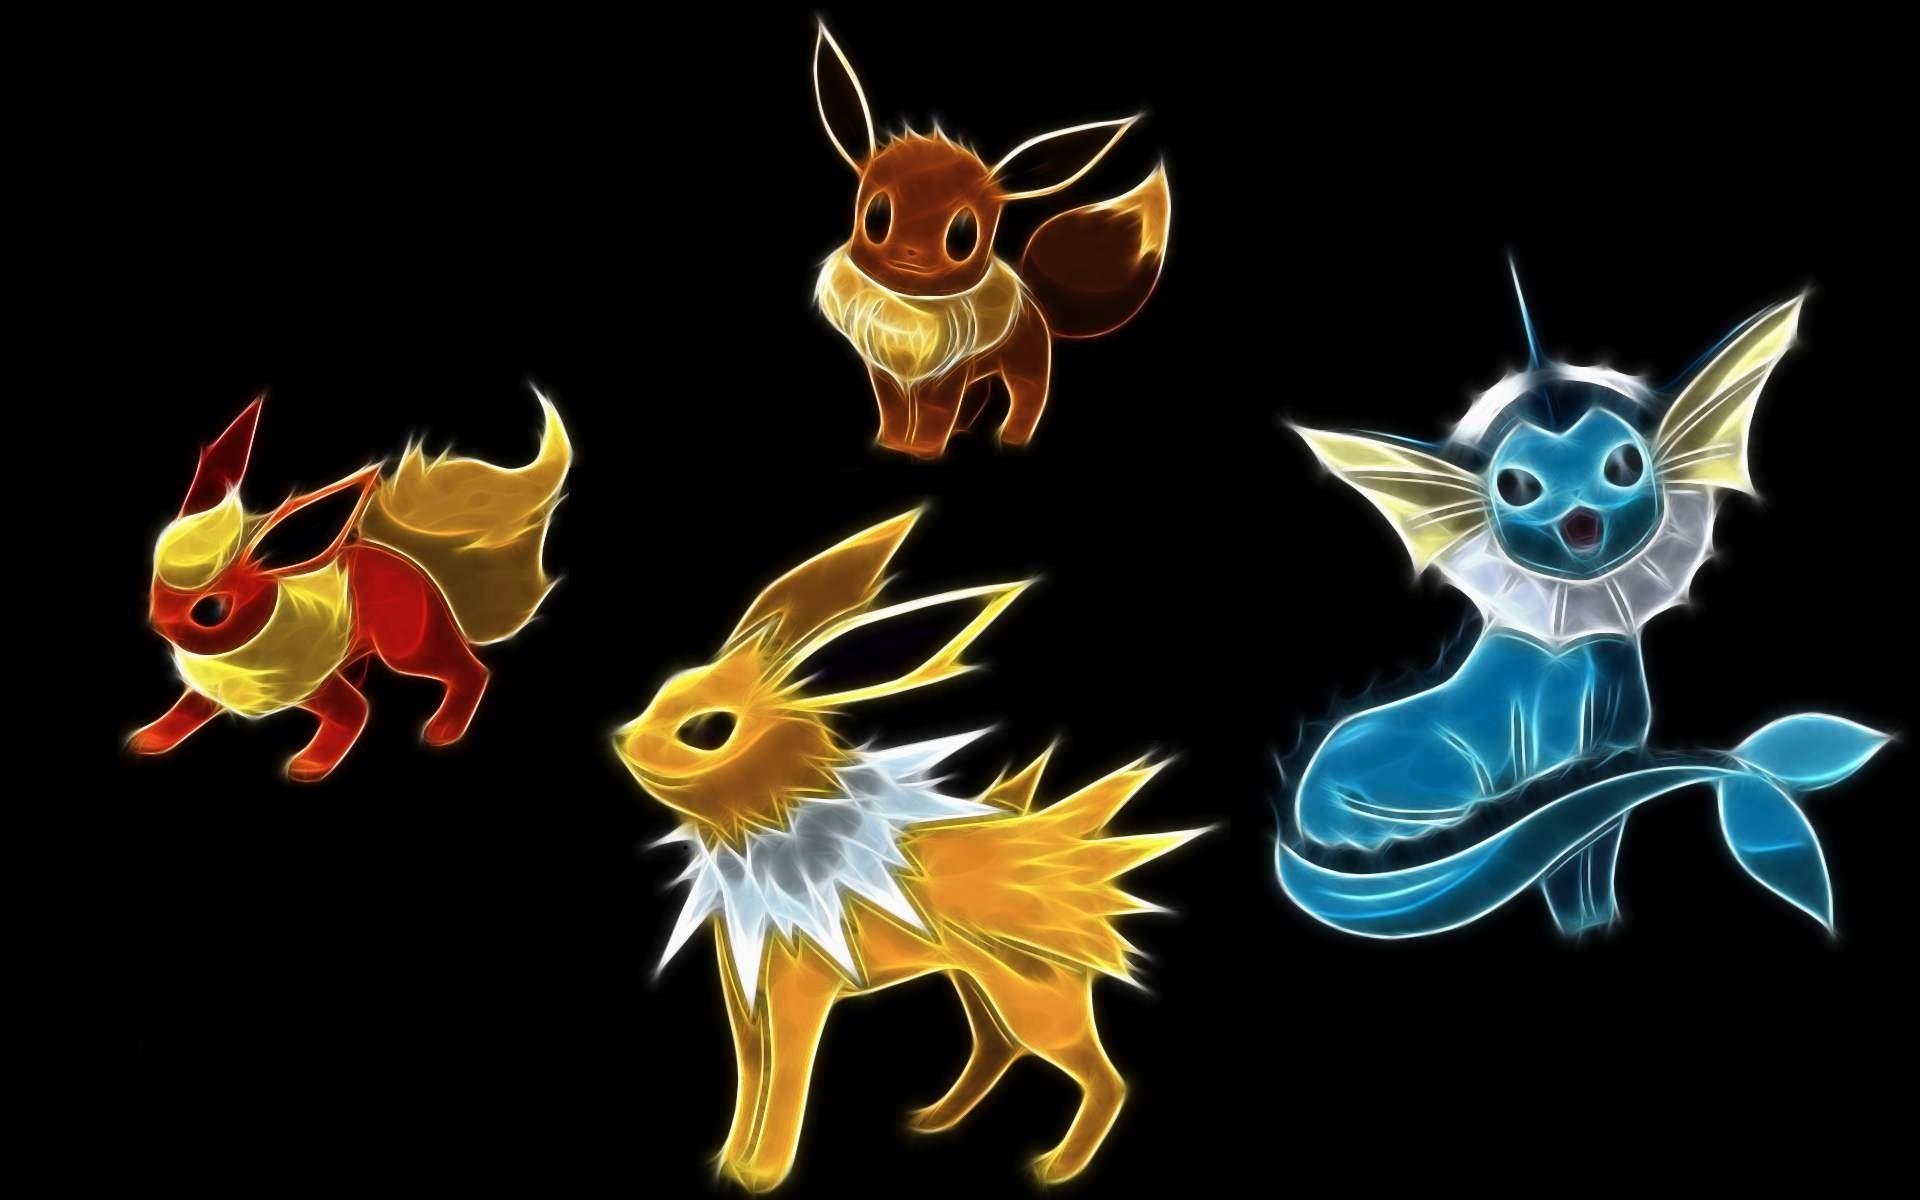 wallpaper.wiki-Pokemon-Phone-Eevee-Photo-HD-PIC-